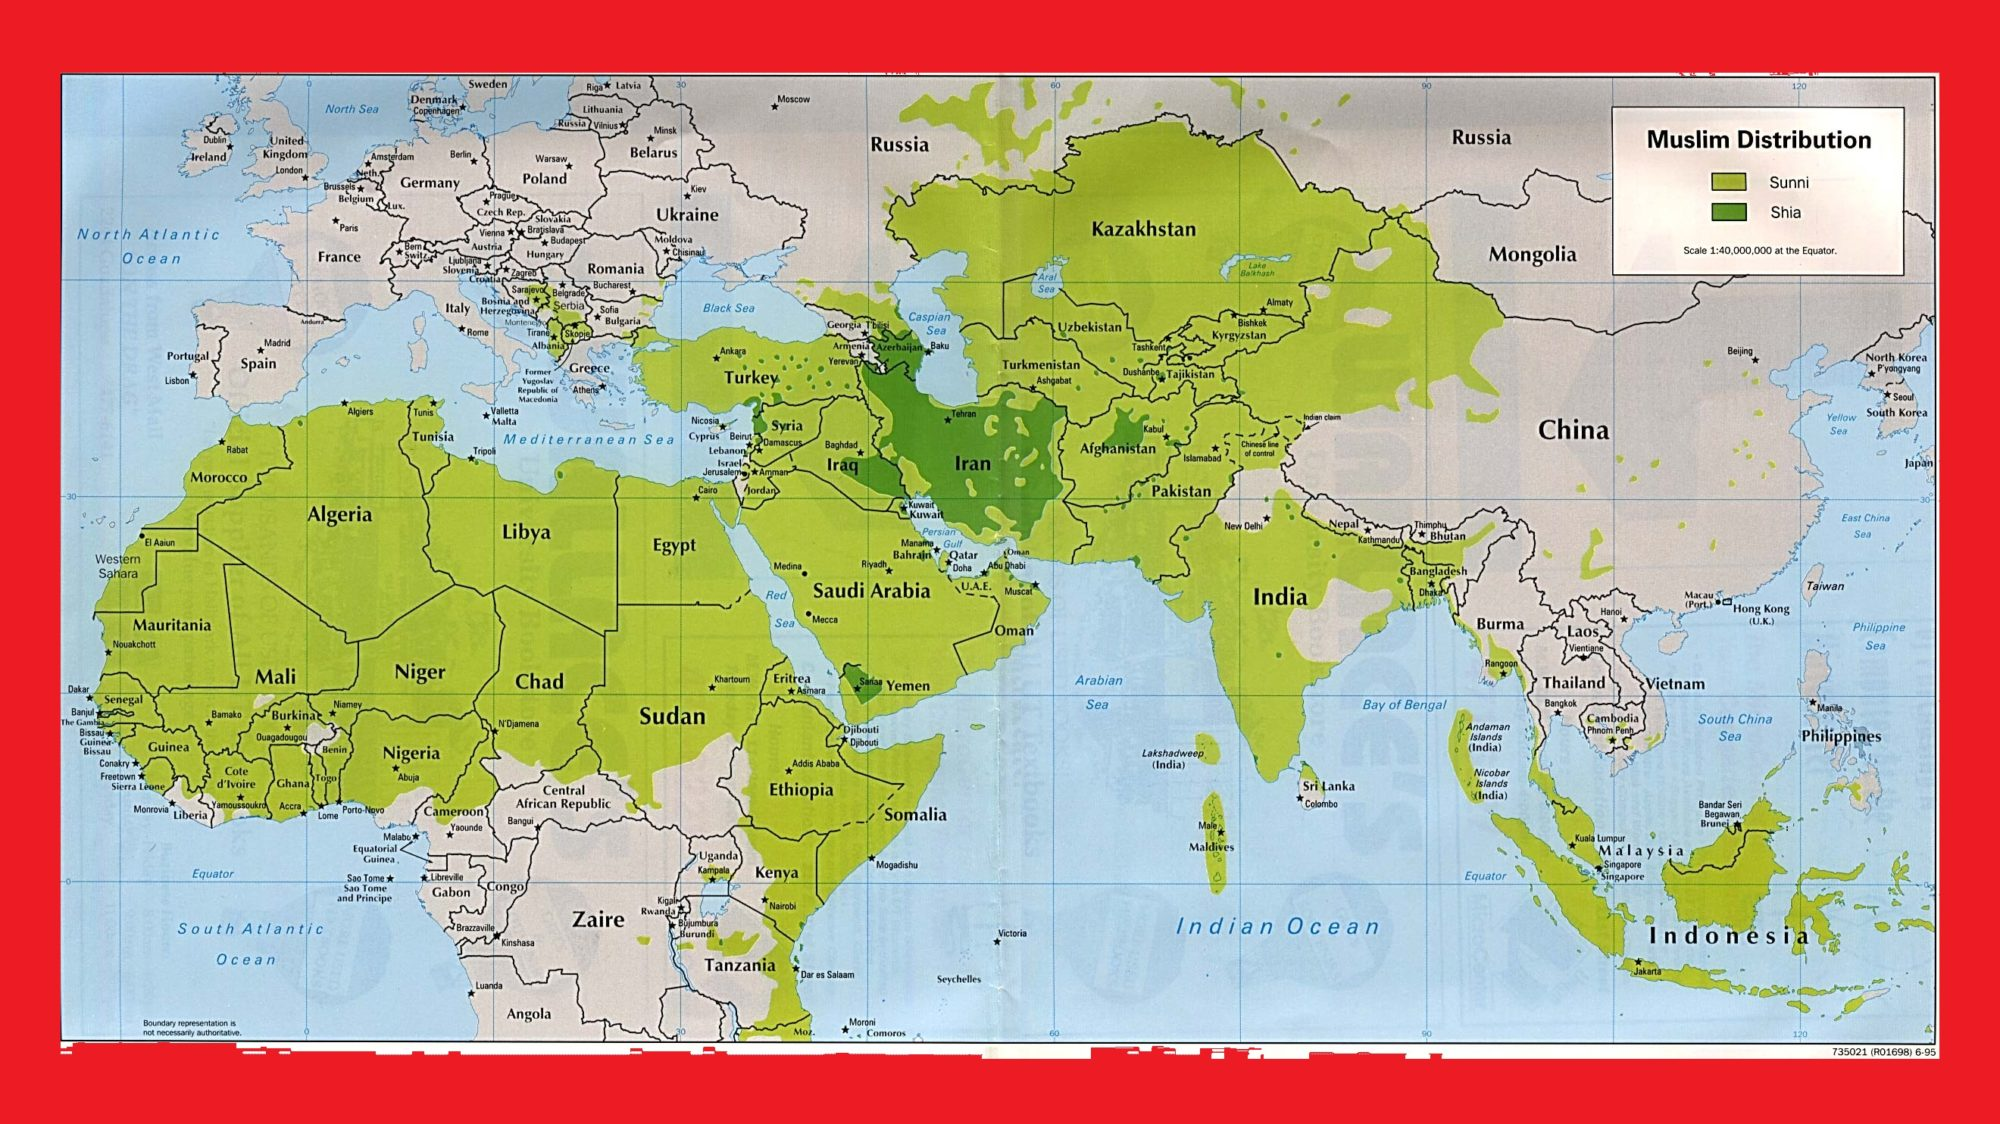 World Muslim Distribution Map | Large, Printable World Religion Map